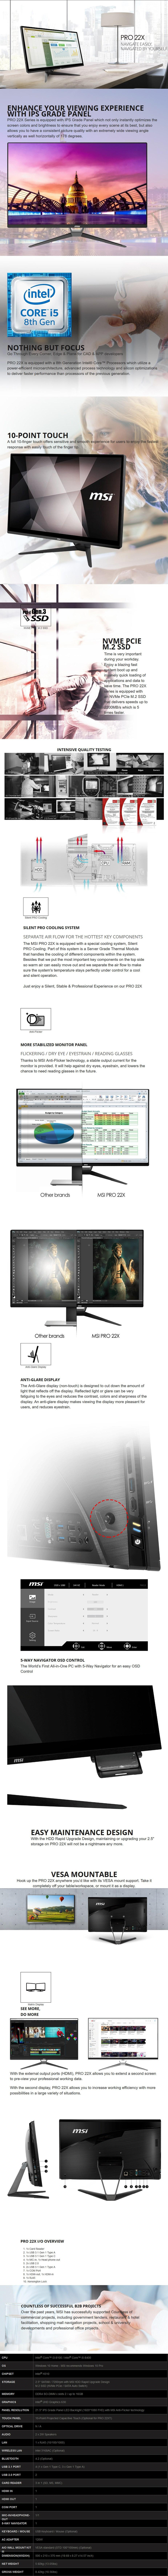 "MSI Pro 22XT 8M 21.5"" All-in-One Desktop PC Intel Core i5-8400 8GB 256GB Win10 Pro - White - Desktop Overview 1"